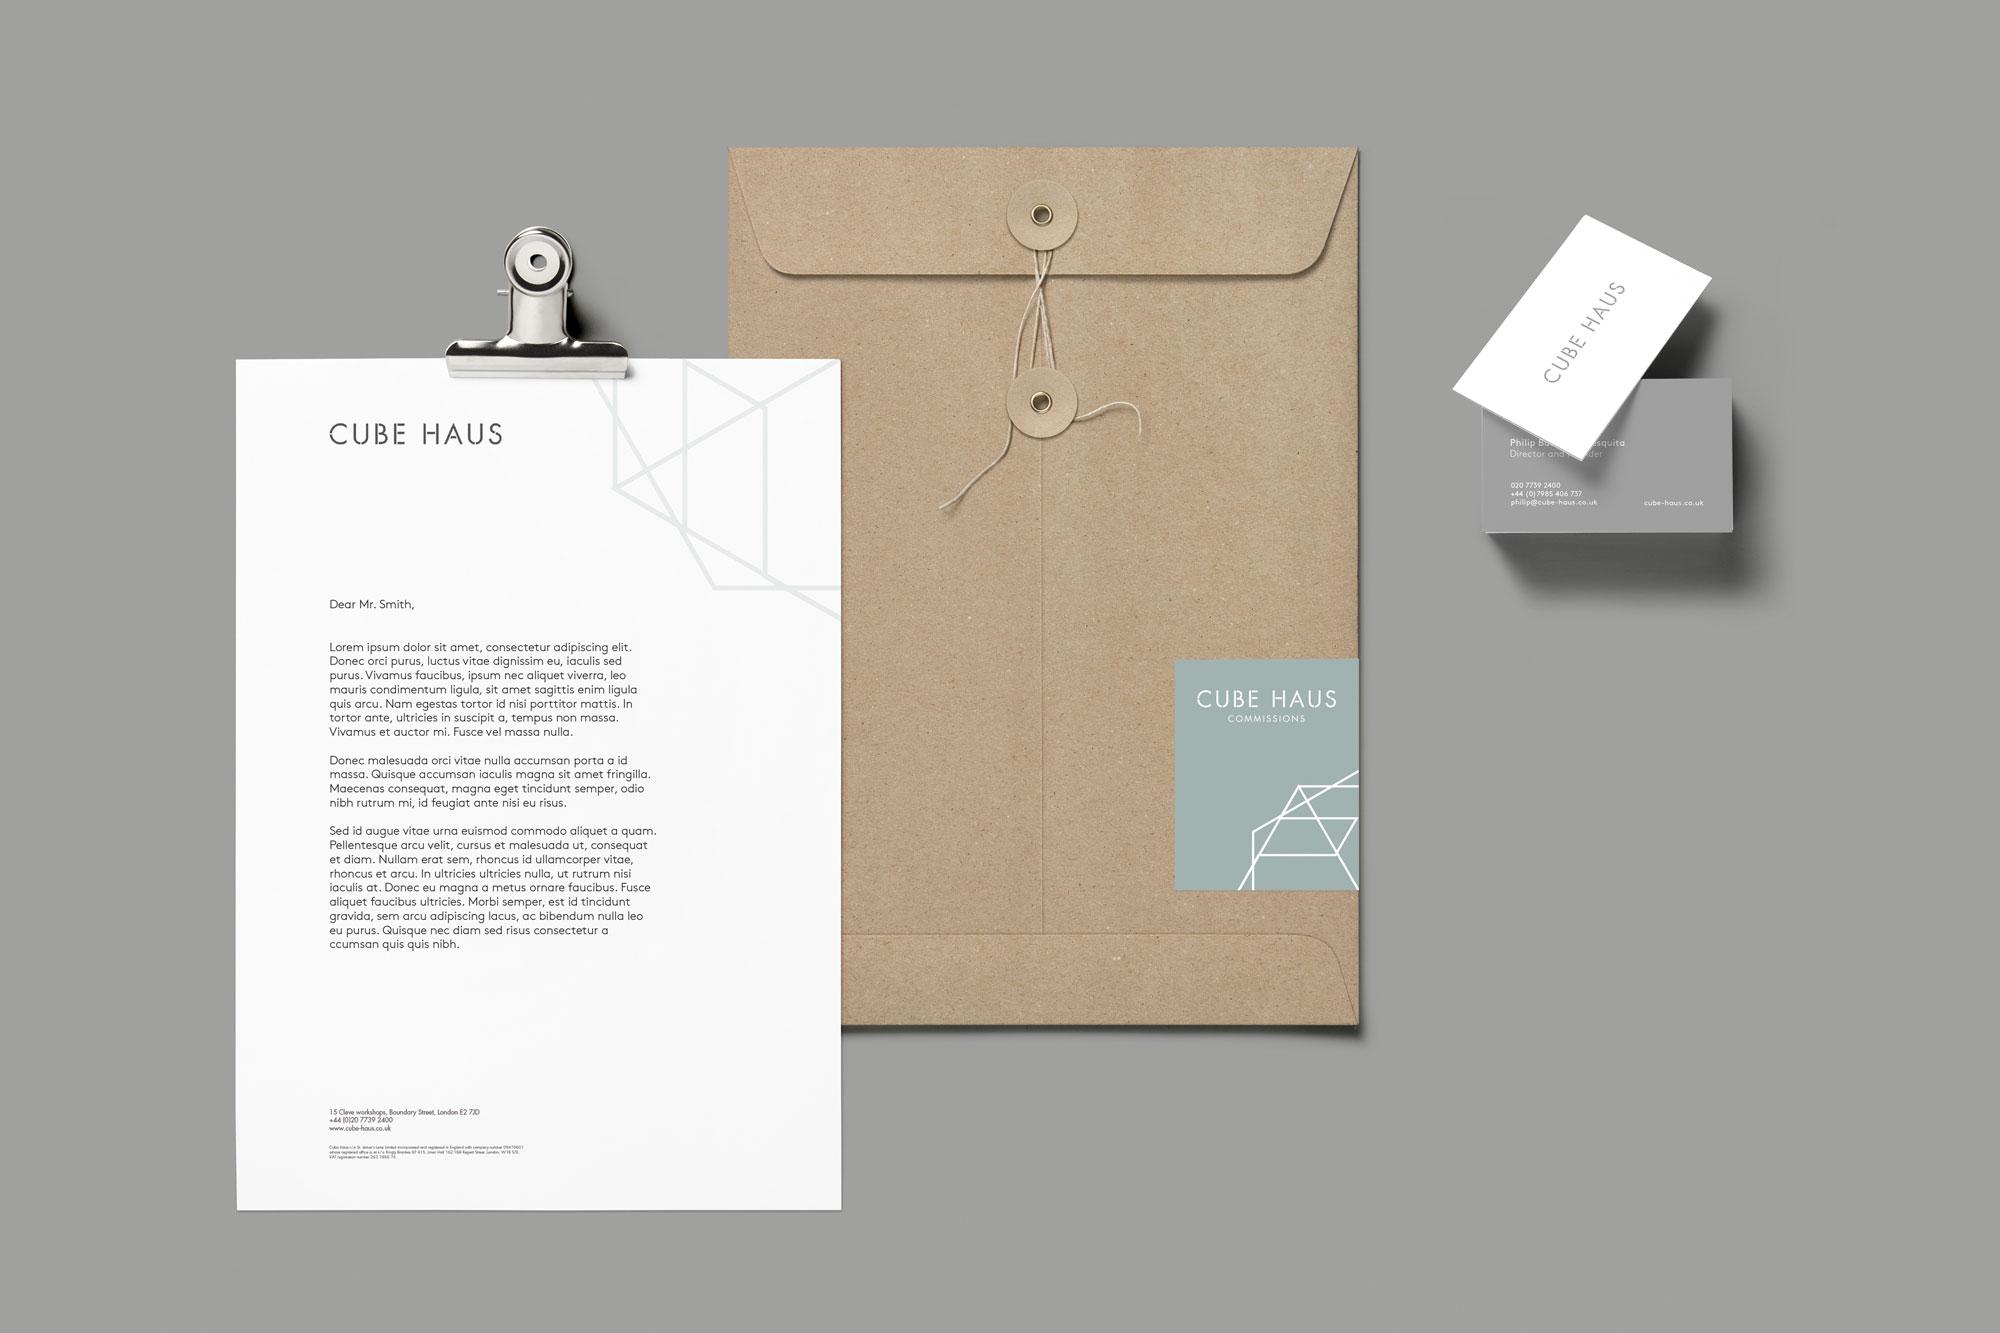 gpj-studio-cube-haus-architects-website-cs-12b